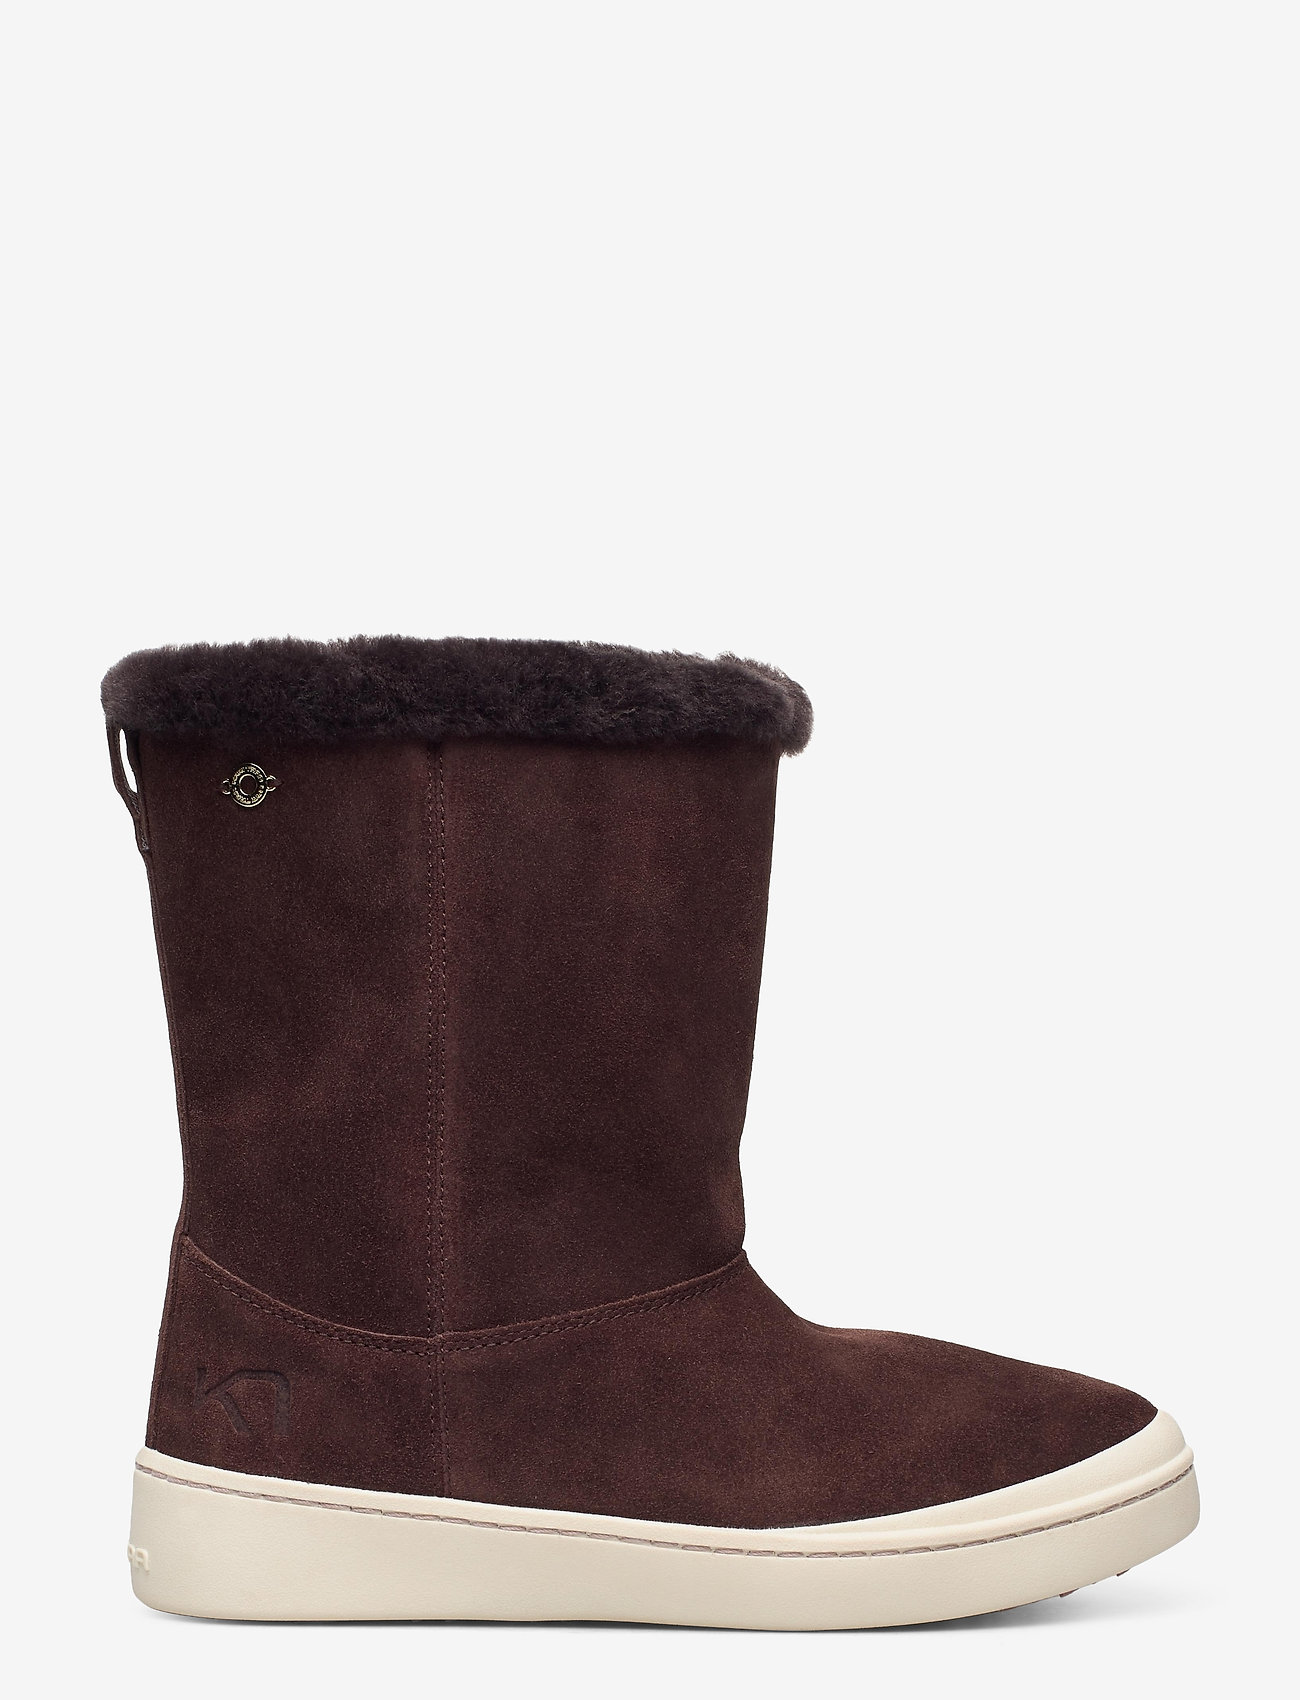 Kari Traa - STEG - flat ankle boots - cigar - 1